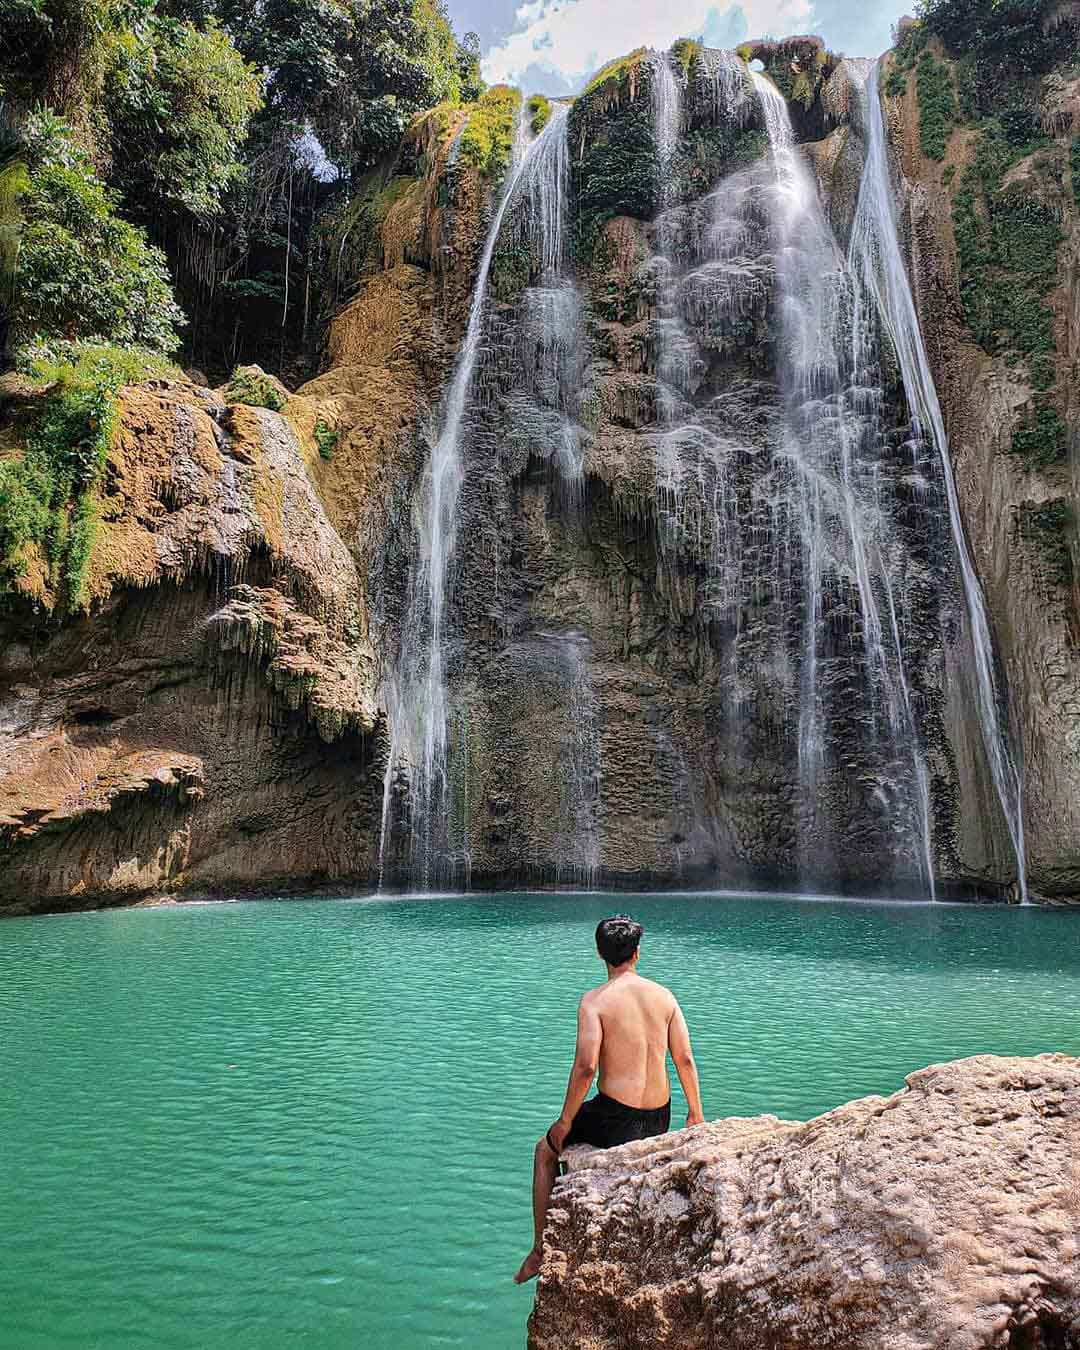 Kolam Yang Ada Di Bawah Air Terjun Tuban Image From @brillyart